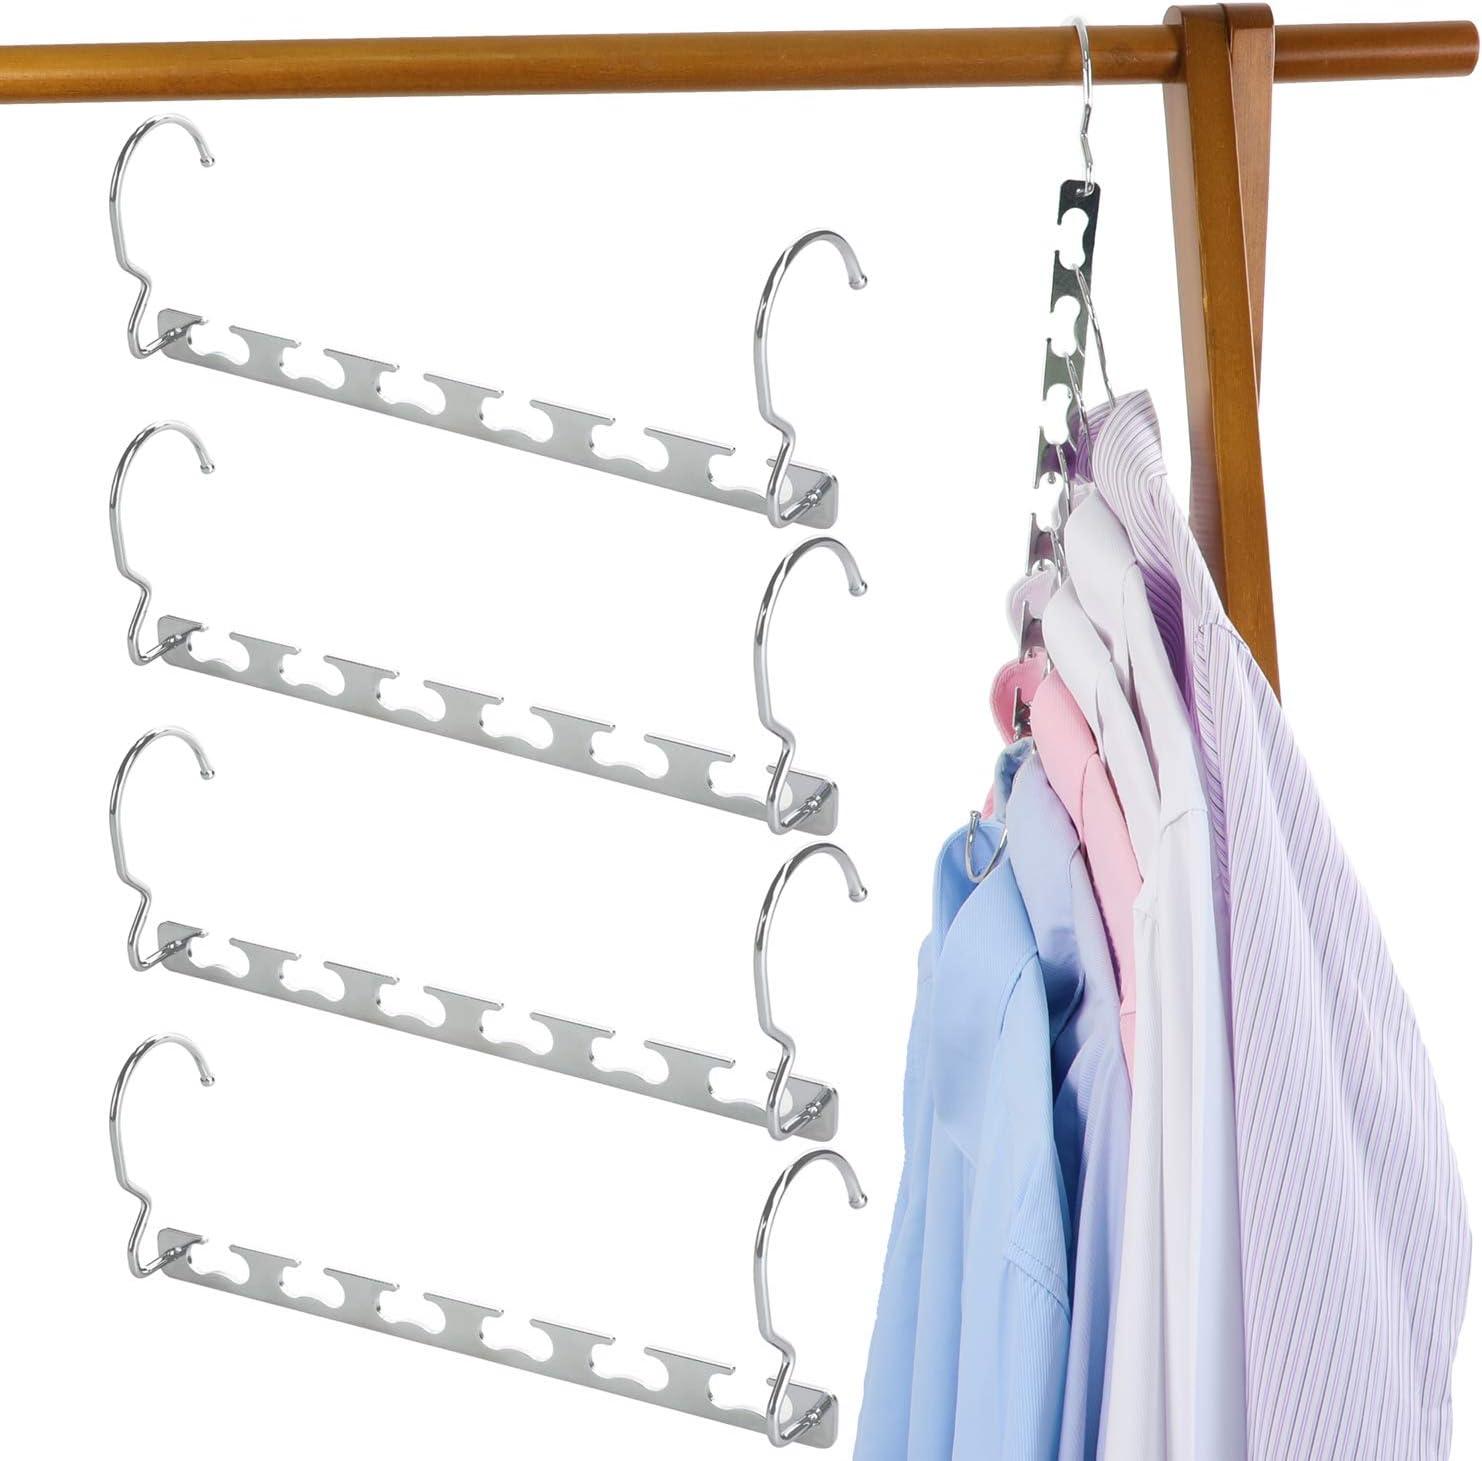 Bathroom JINGYOU Hat Organizer Hanger Portable Folding Clothes Hanger Cap Organizer Hanger Magic Clothes Hanger Organizer Cap Organizer Hanger Fit For Clothes Organizer In Dormitory Bedroom